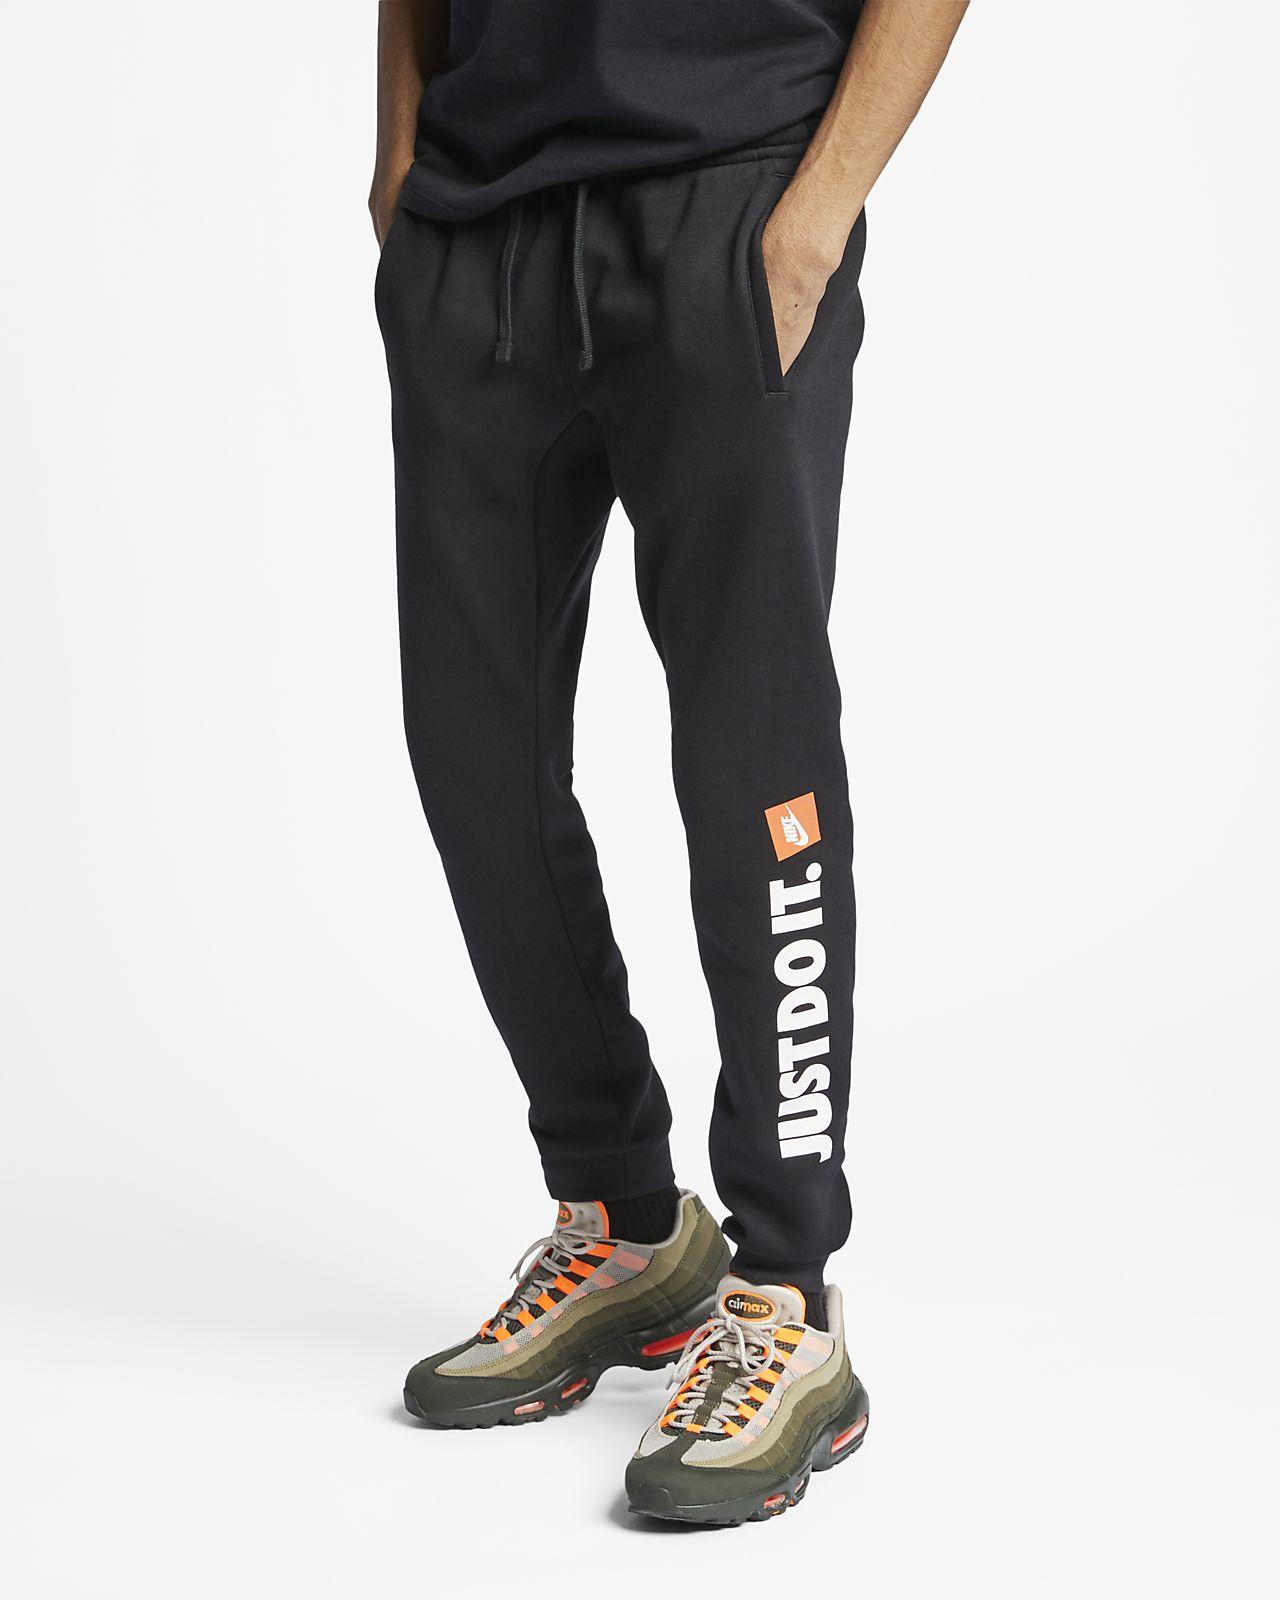 996012eb01529 Nike Sportswear JDI Jogger de tejido Fleece - Hombre. Nike.com ES